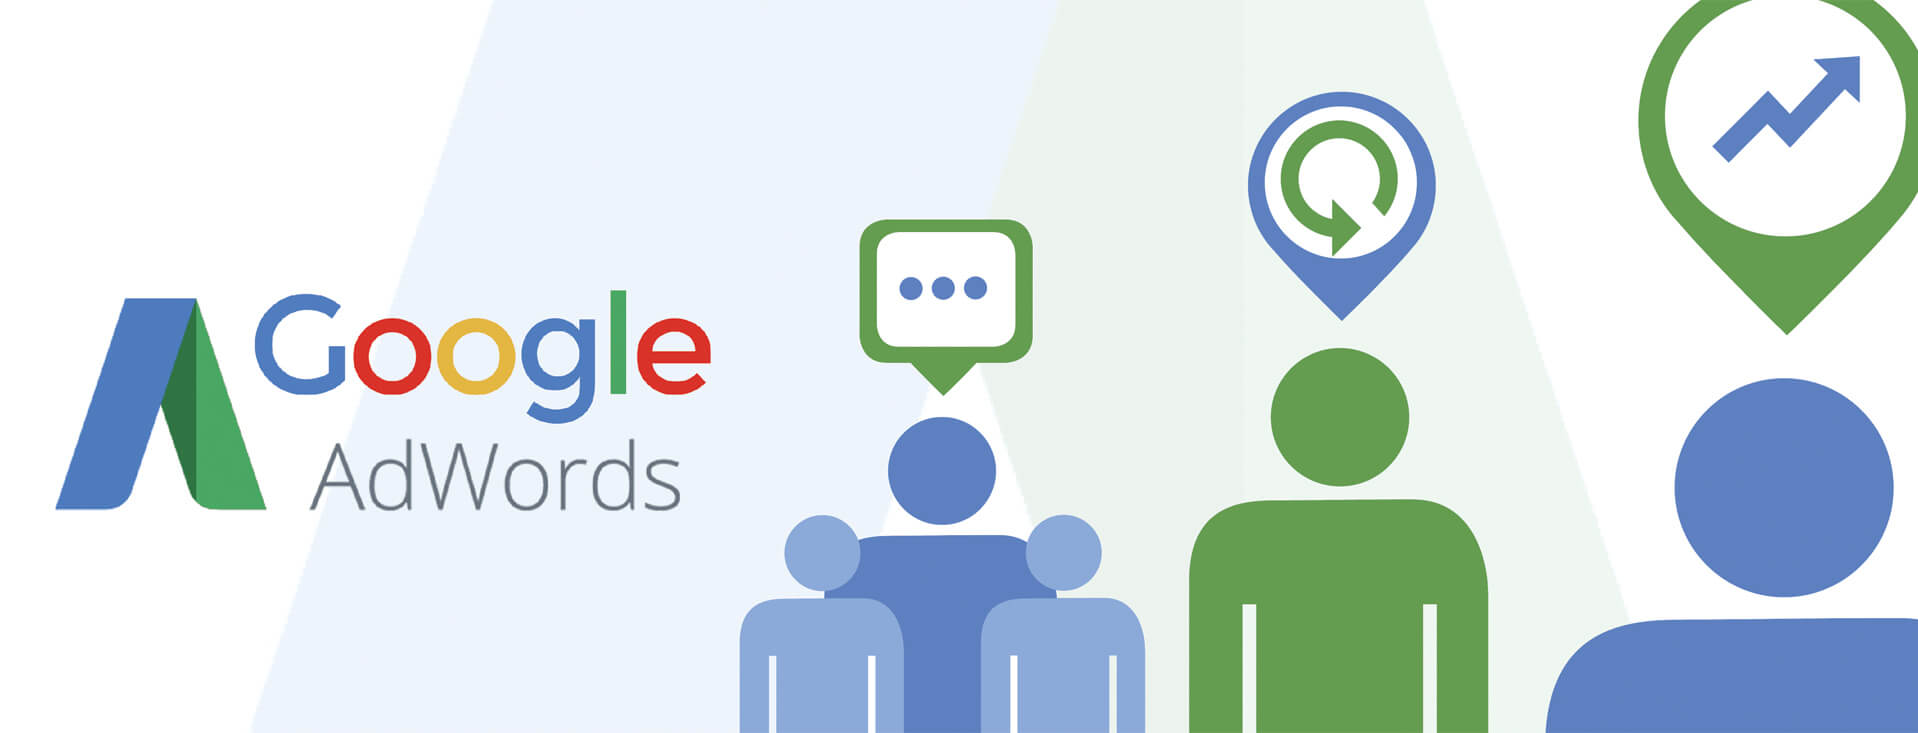 Google Adwords blog image